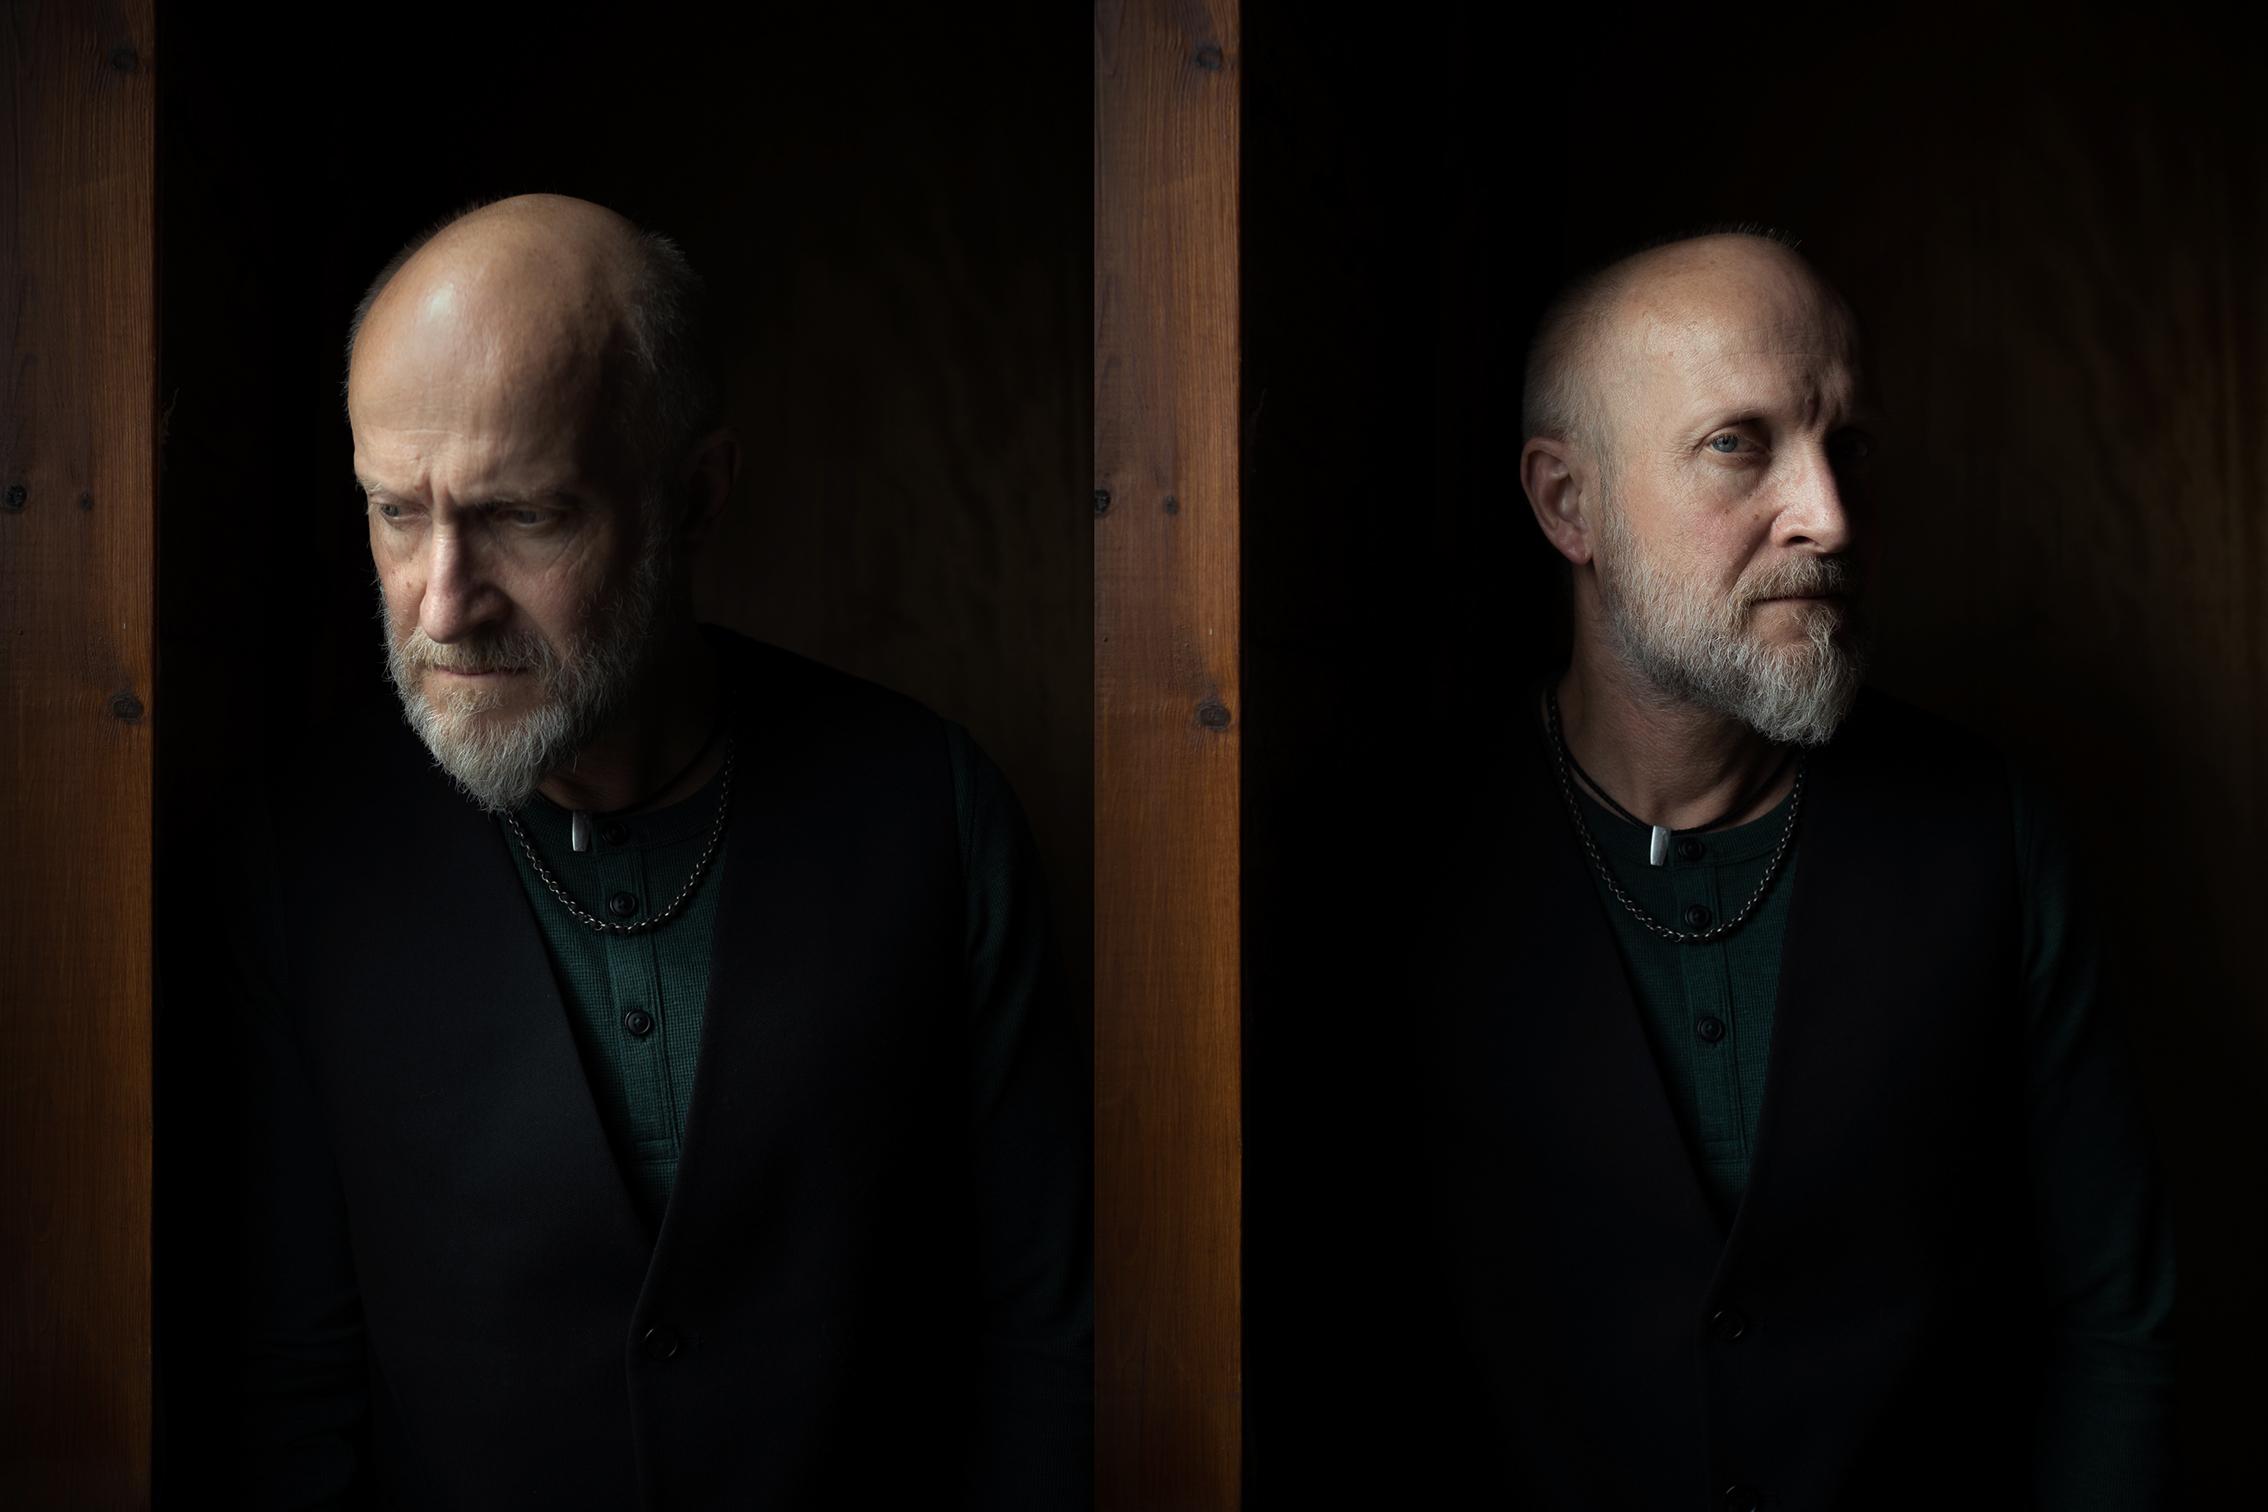 Novelist Lars Saabye Christensen